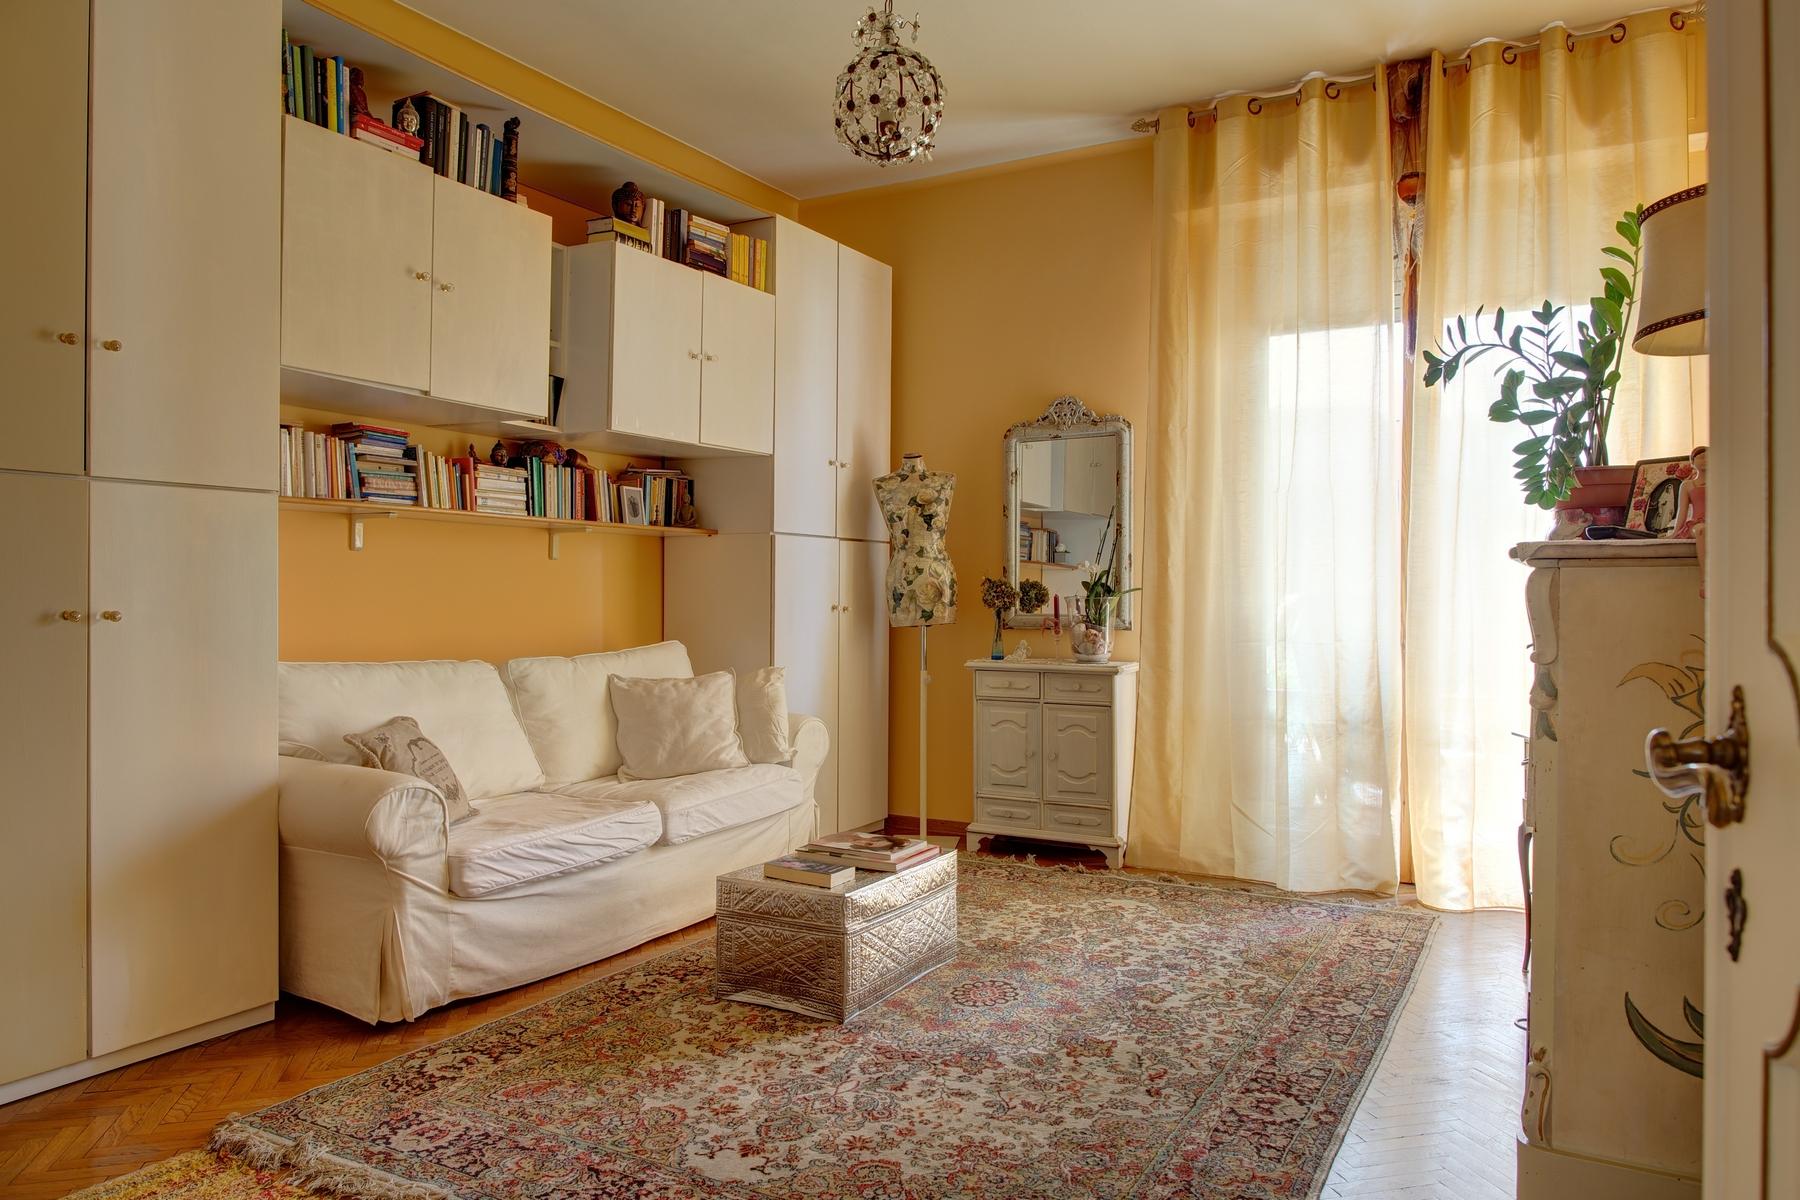 Attico in Vendita a Firenze: 5 locali, 130 mq - Foto 7